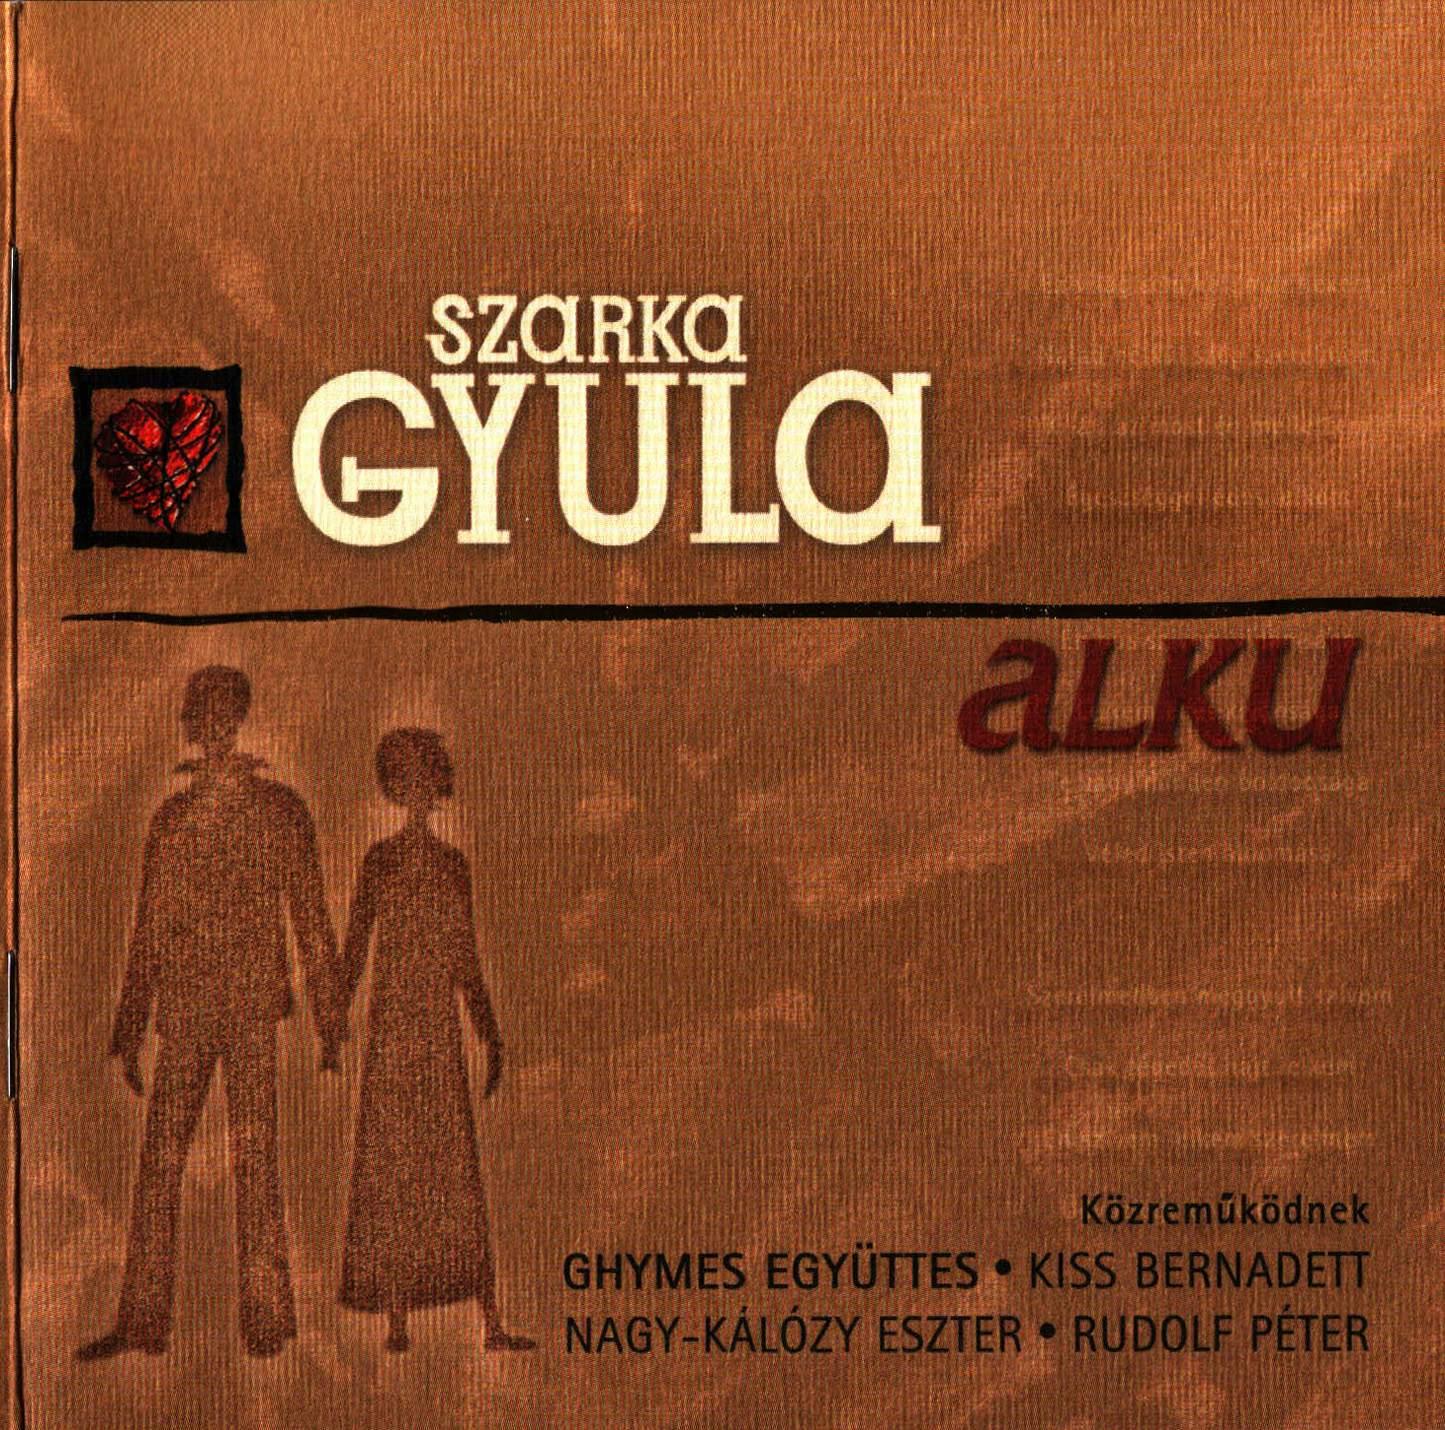 Szarka Gyula Alku